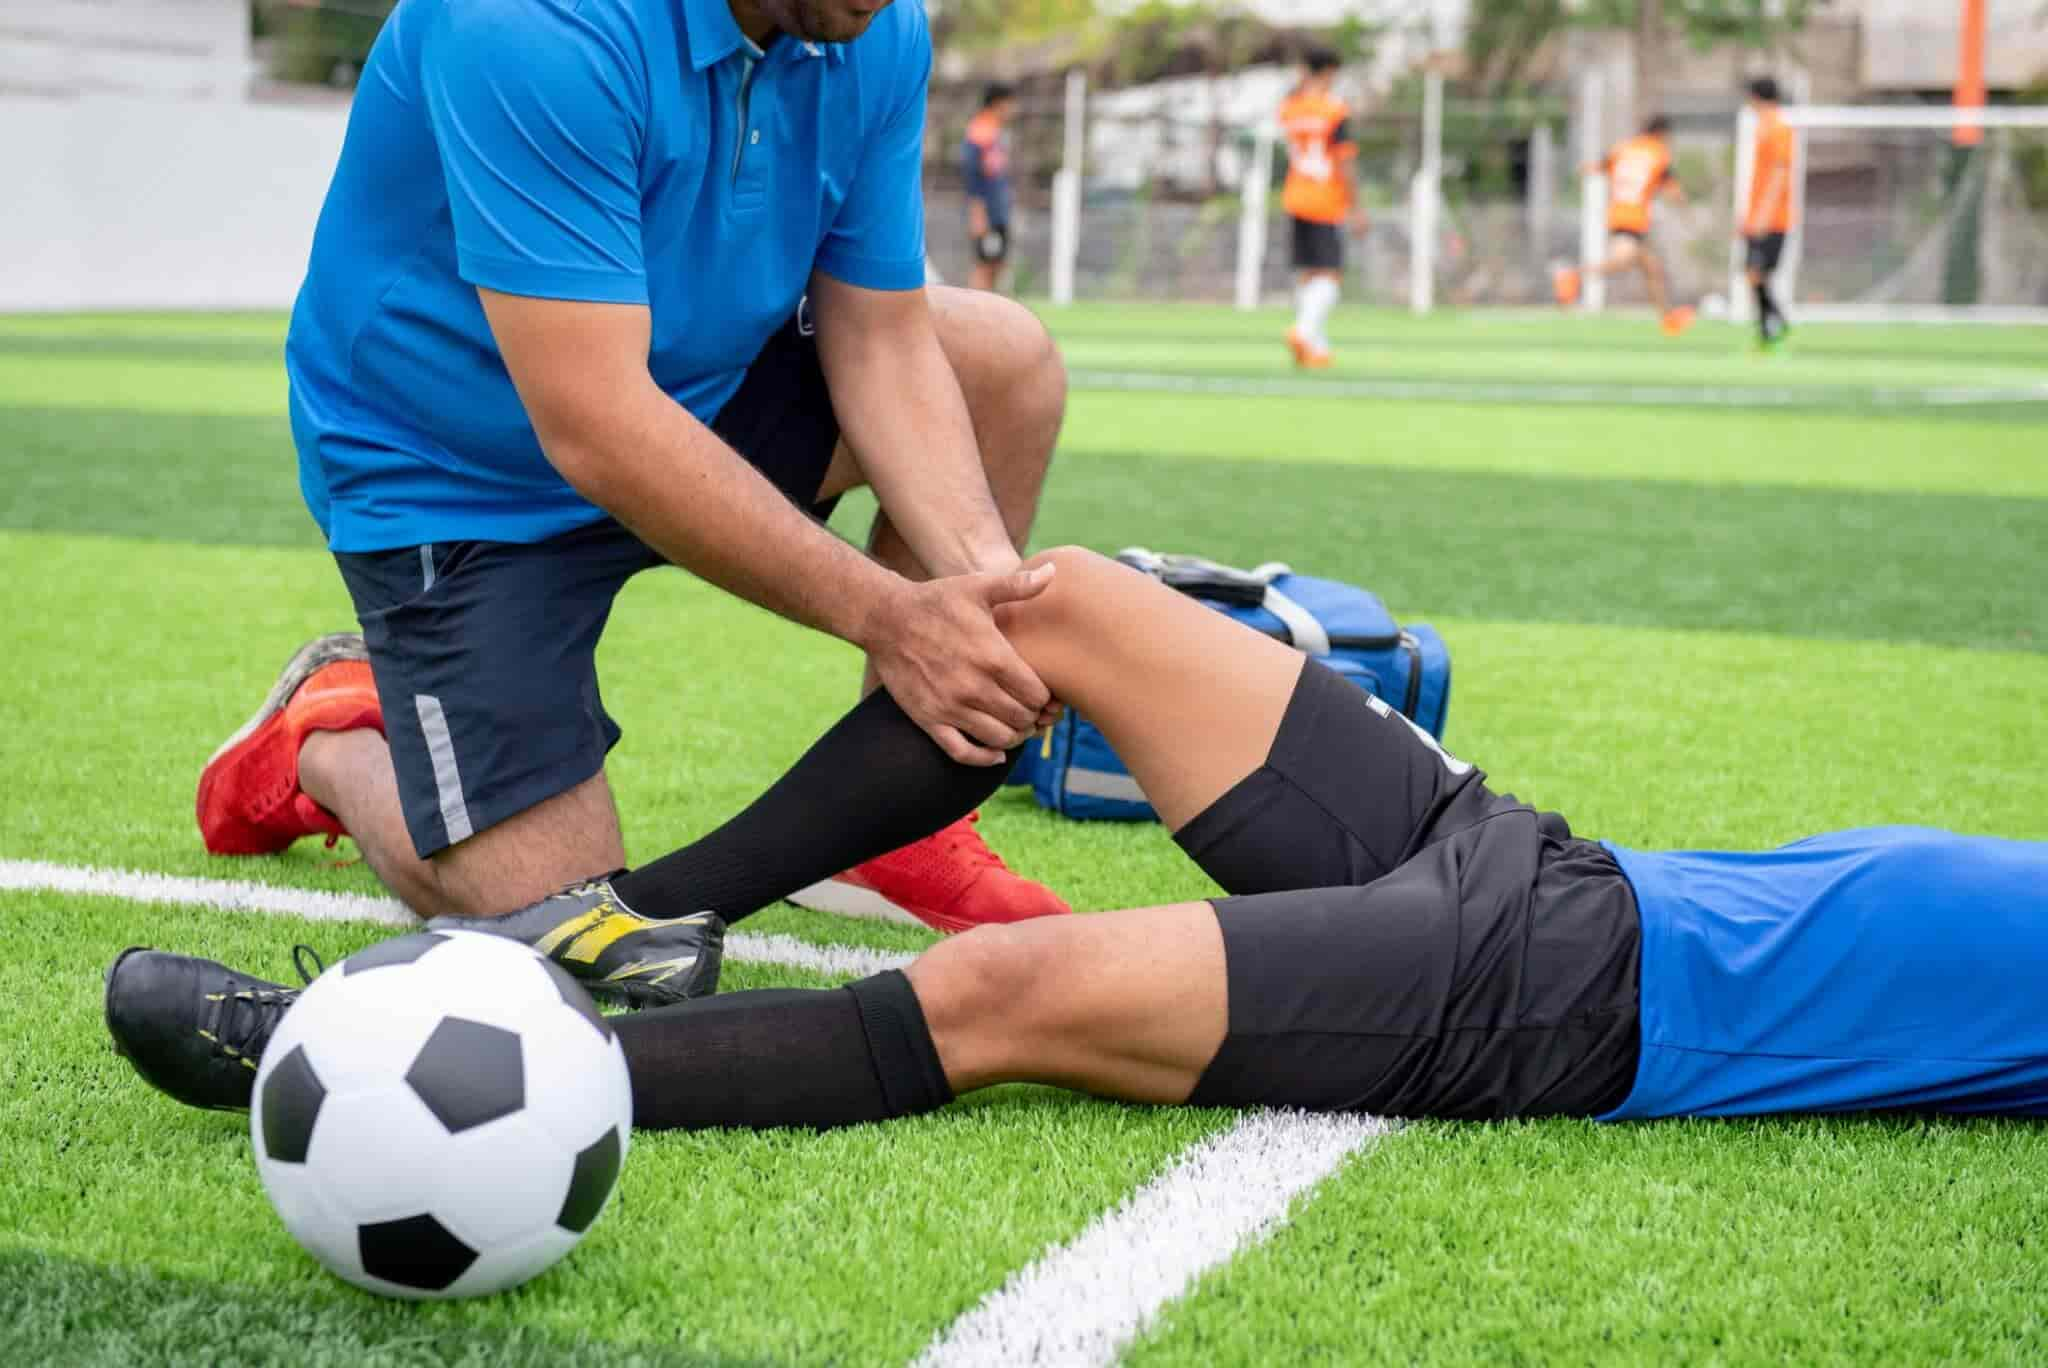 Injured Soccer Athlete with Injury